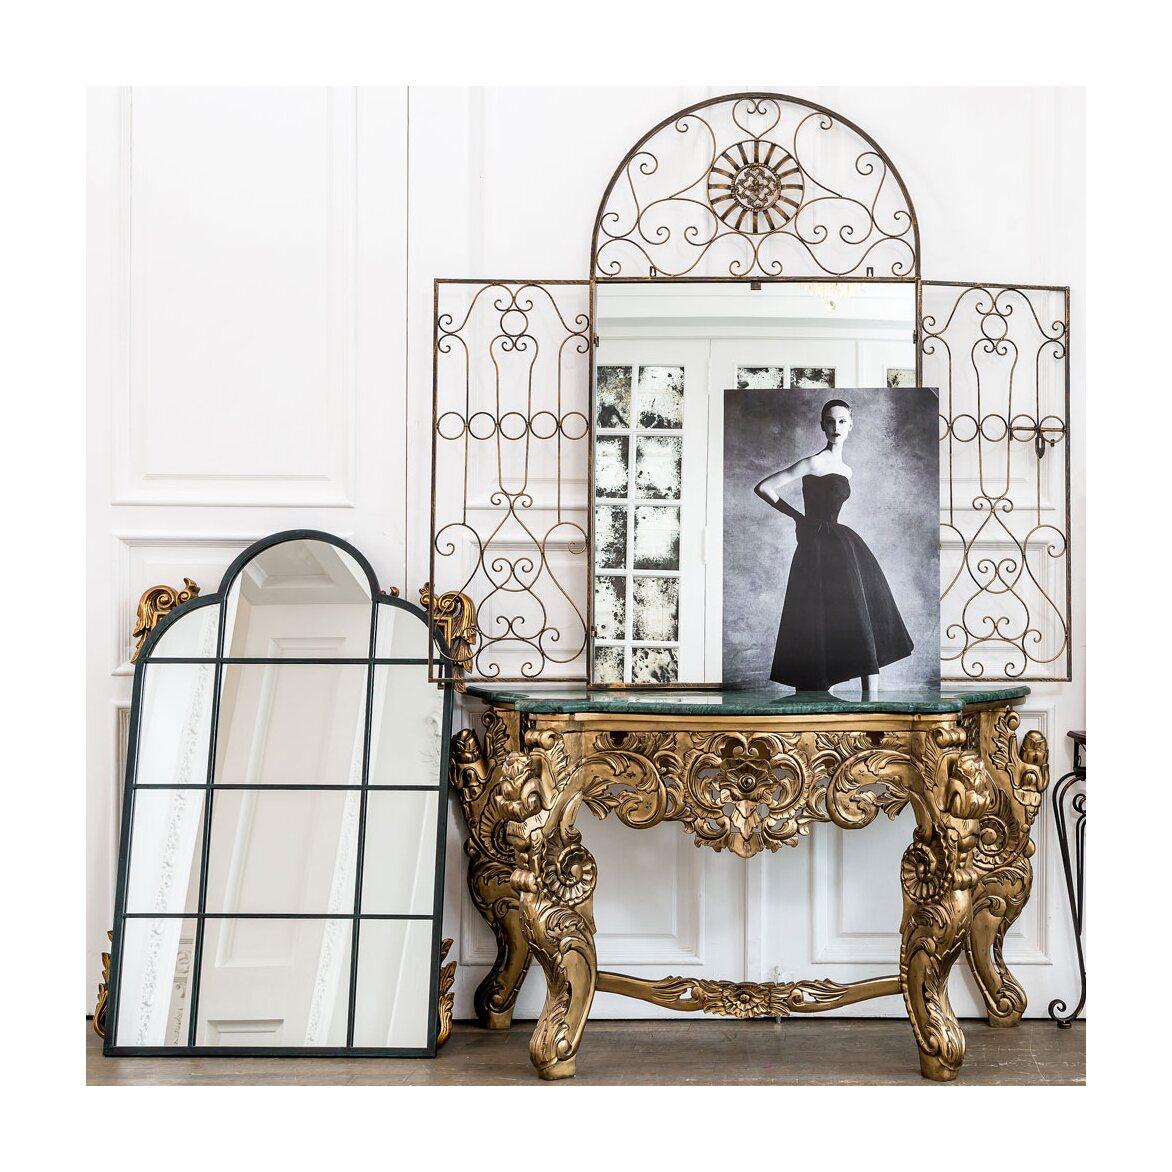 Настенное зеркало «Дивон» (королевская бронза) 3 | Настенные зеркала Kingsby